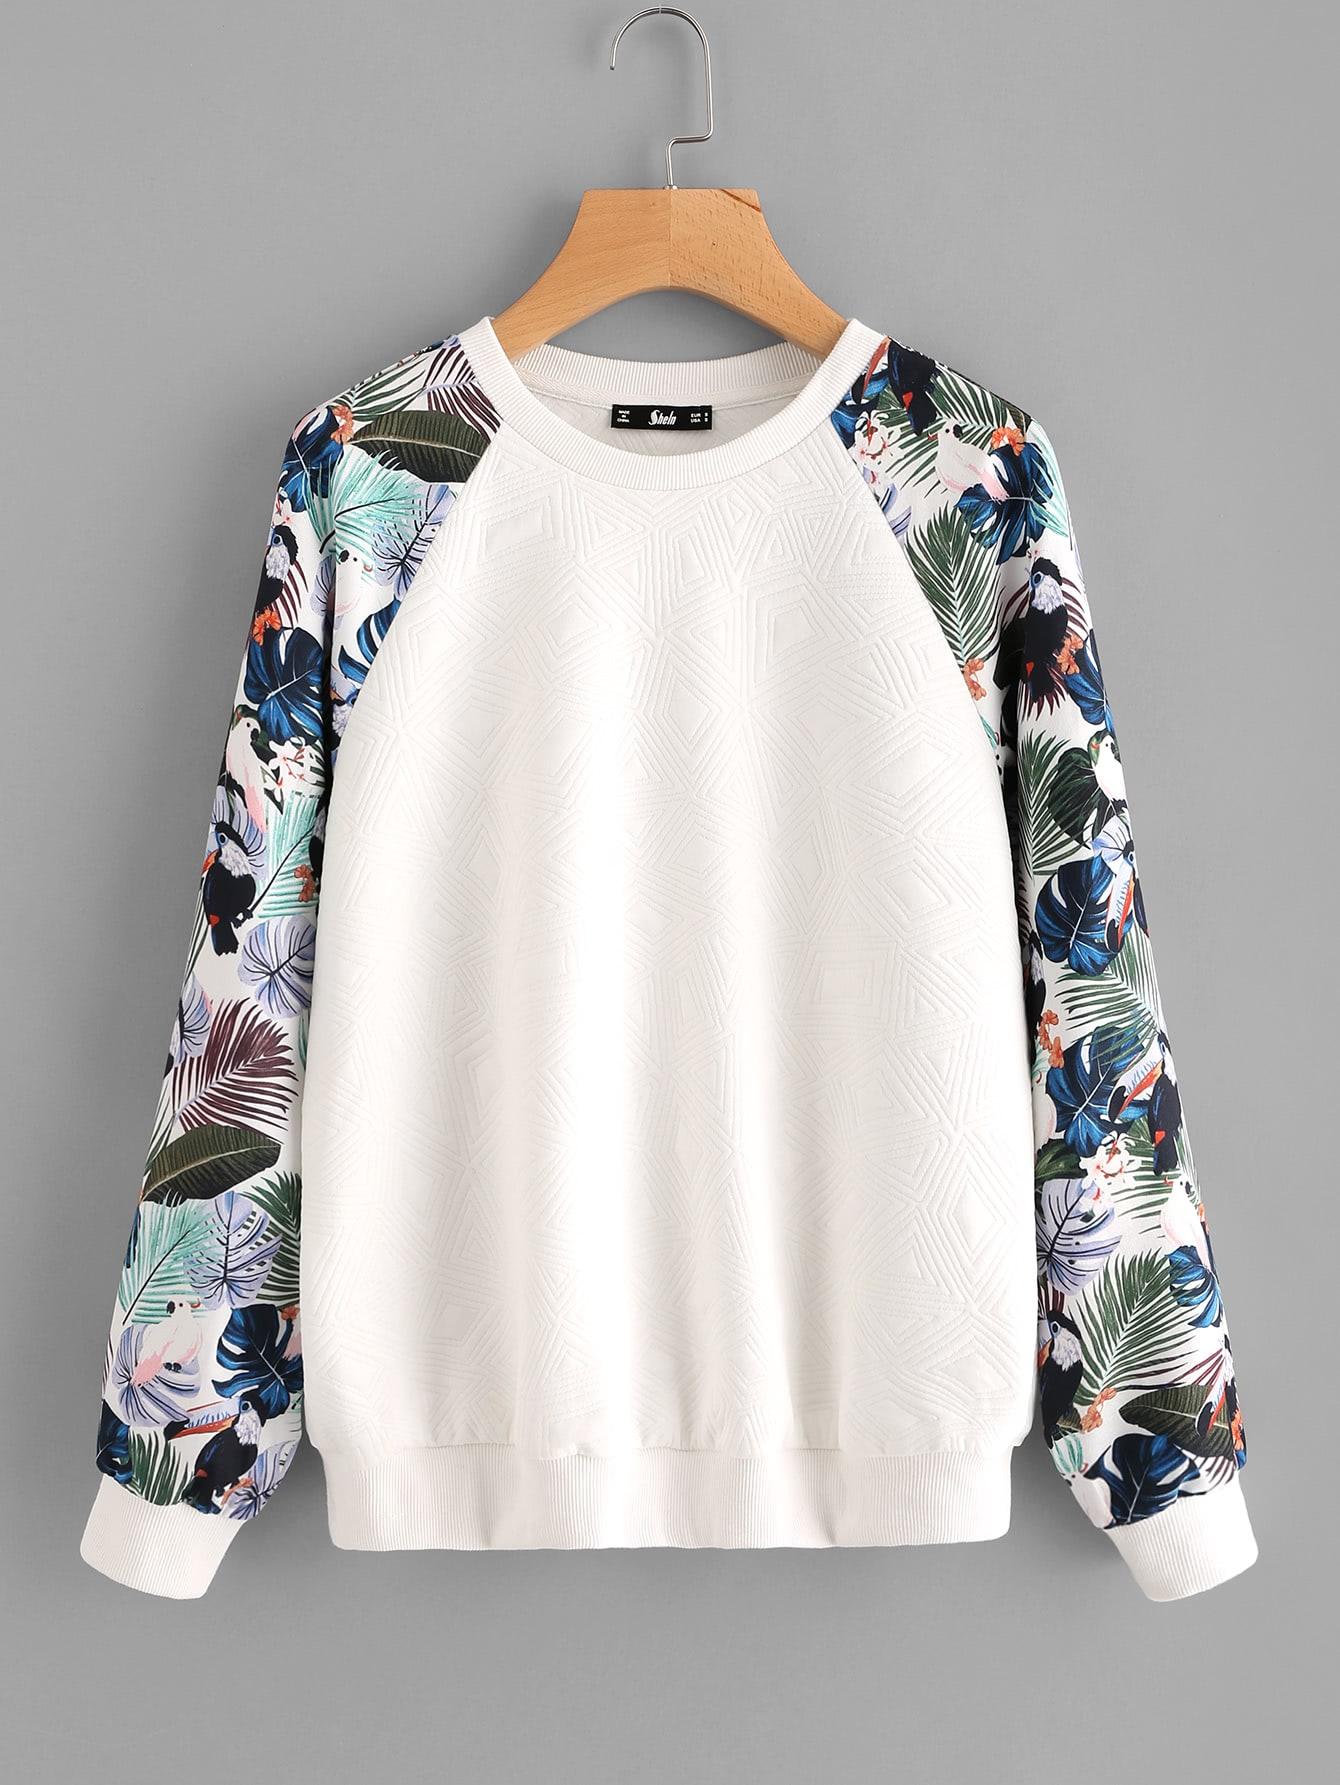 Tropical Print Raglan Sleeve Textured Sweatshirt two tone raglan sleeve sweatshirt